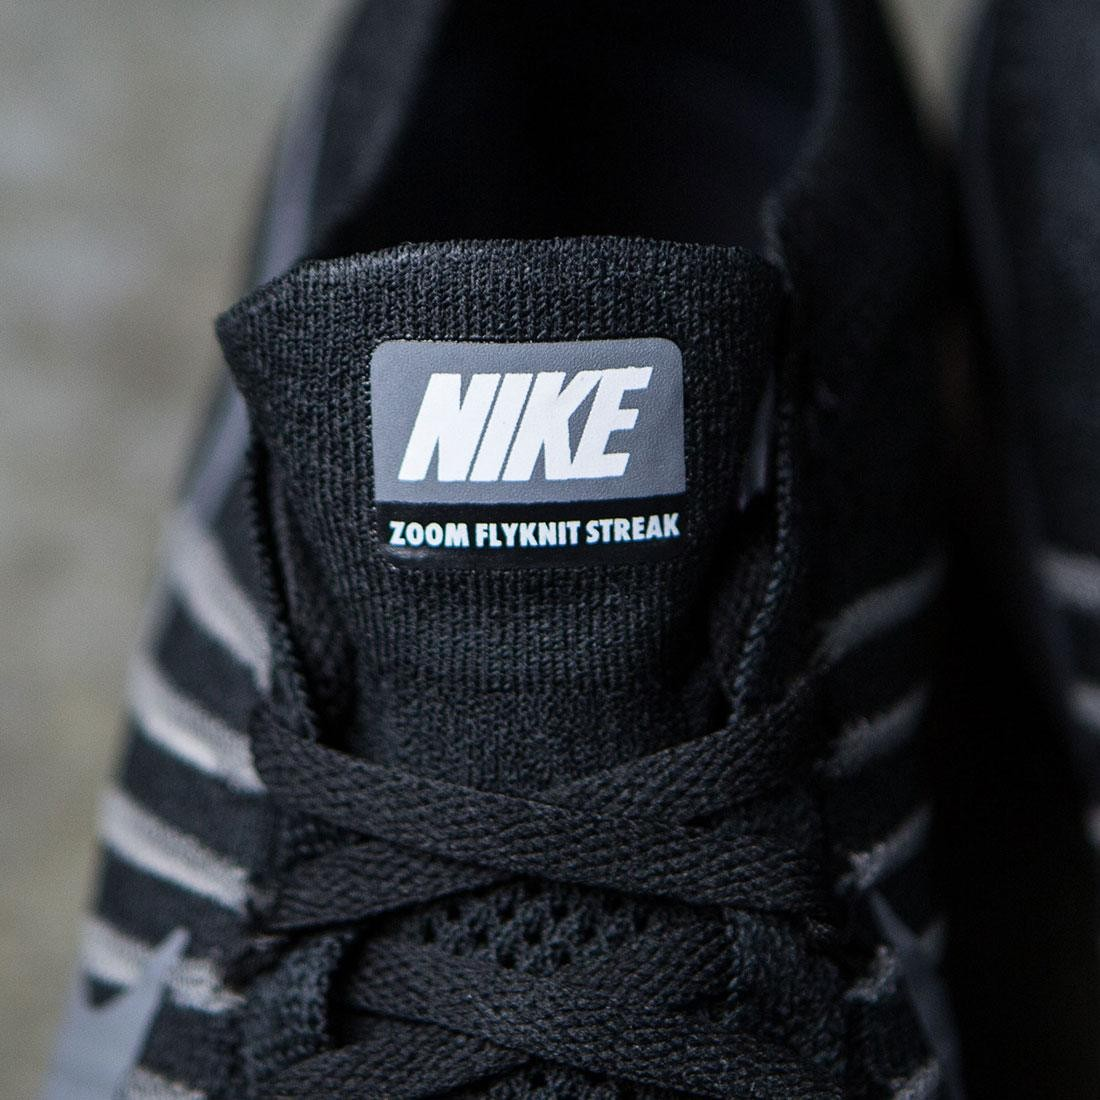 finest selection 3fdfe 7461b Nike Men Air Zoom Flyknit Streak 6 Racing (black   dark grey-white)